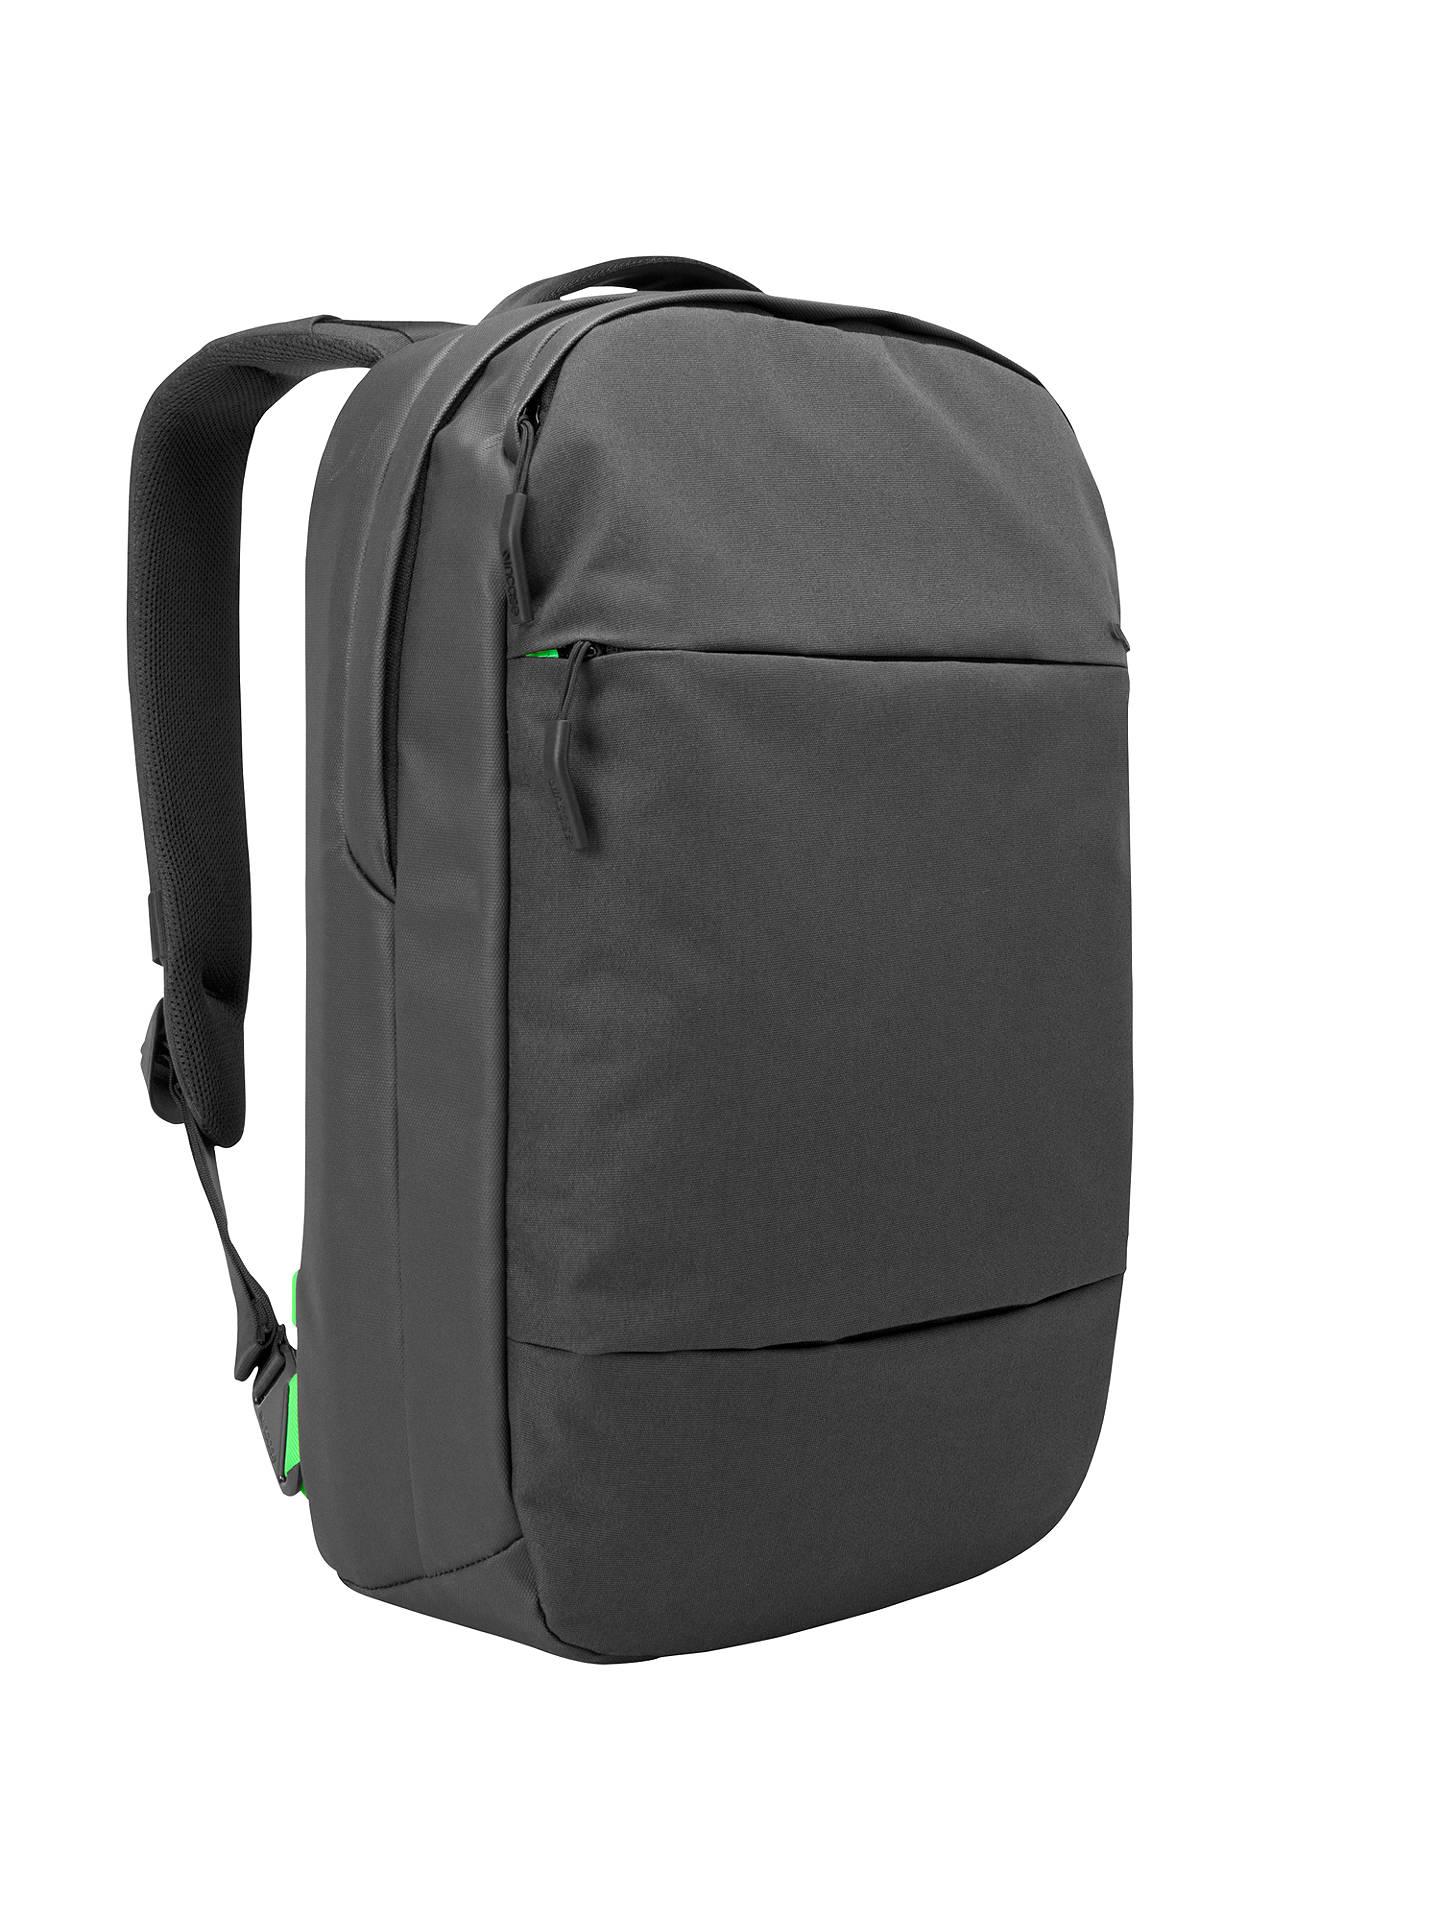 4af0f7a1bdfa Incase City Compact Backpack for 15